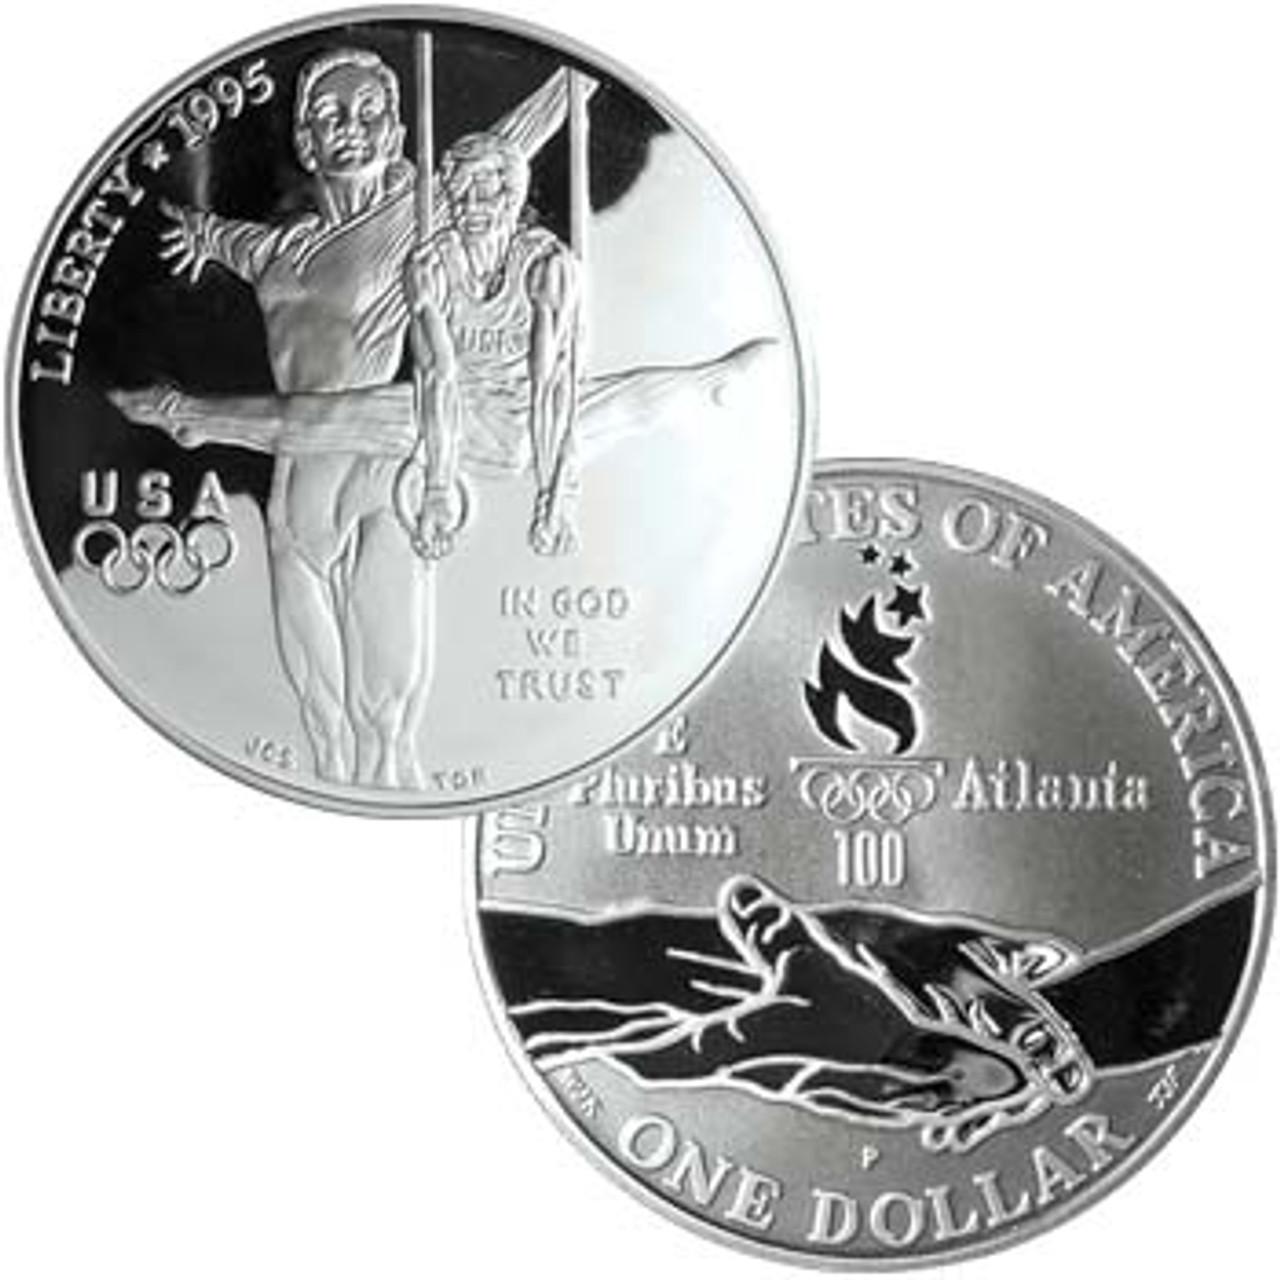 1995-P Olympic Gymnastics Silver Dollar Proof Image 1